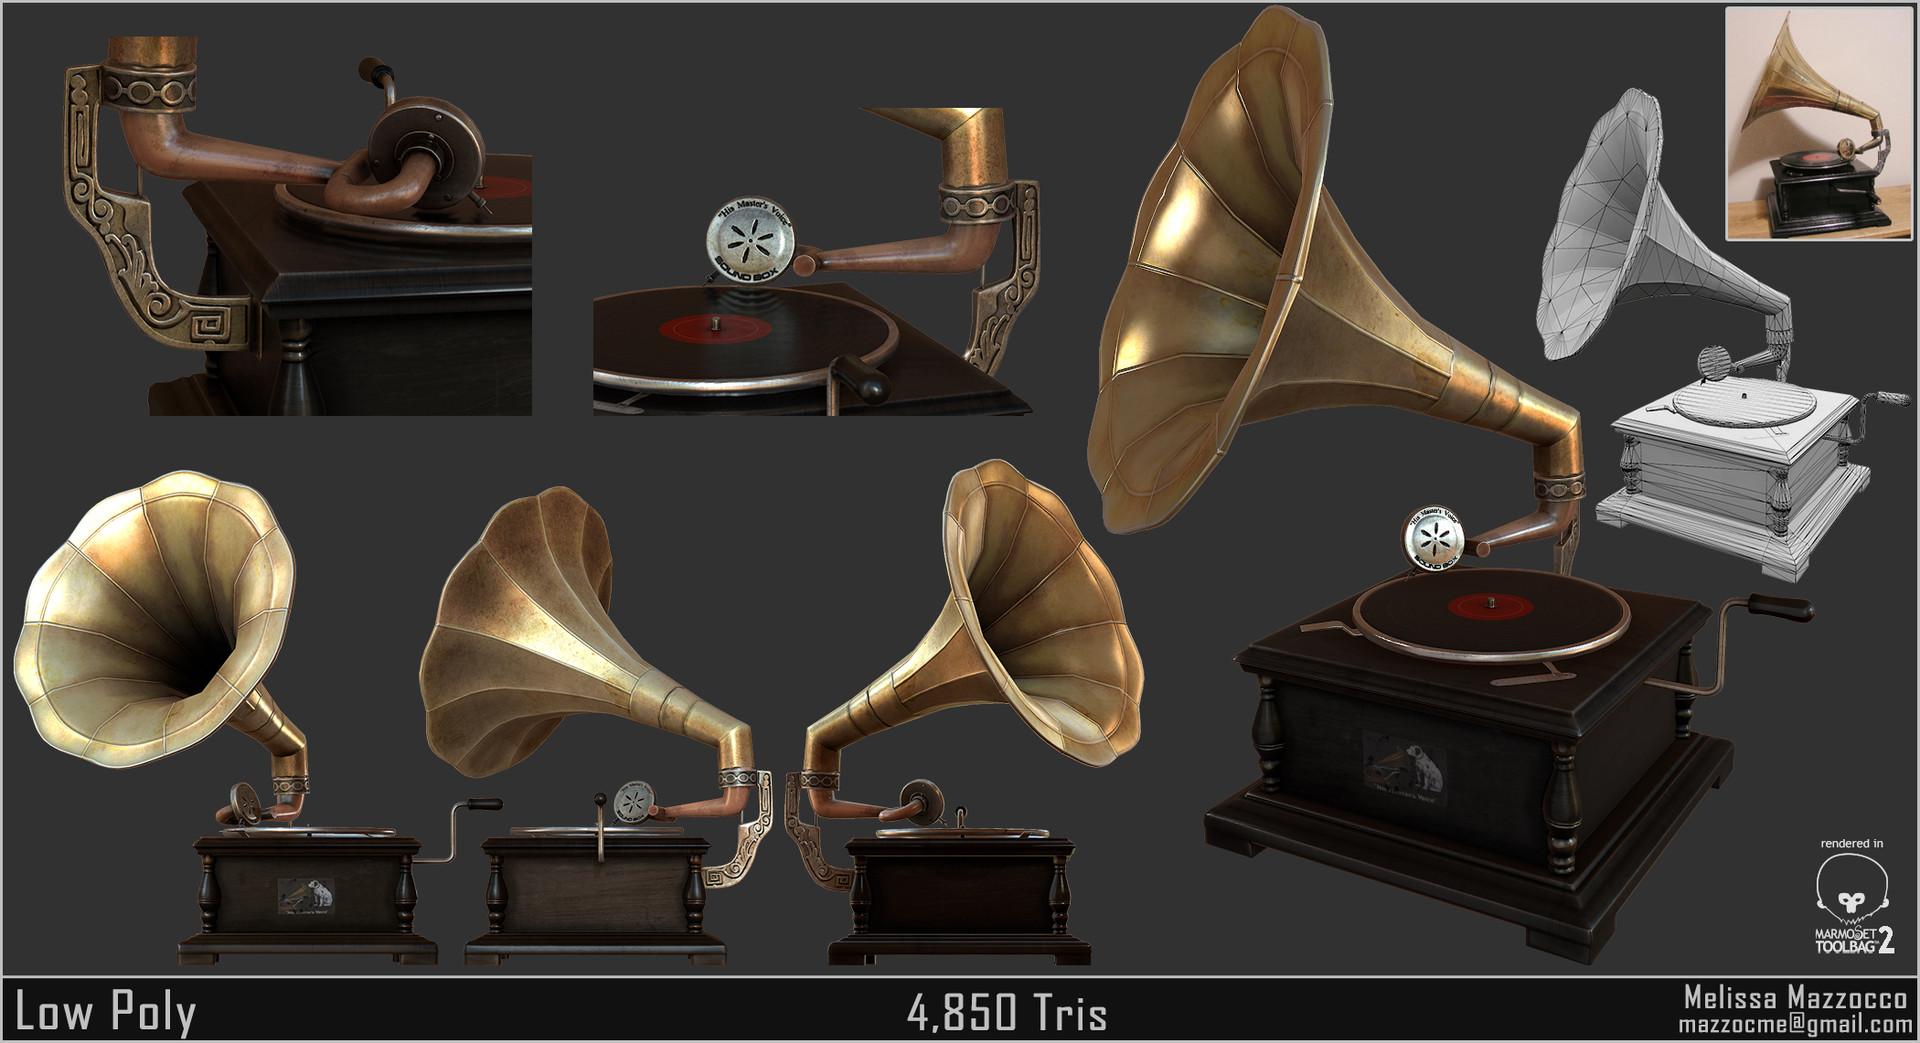 Melissa mazzocco gramophone lp redo